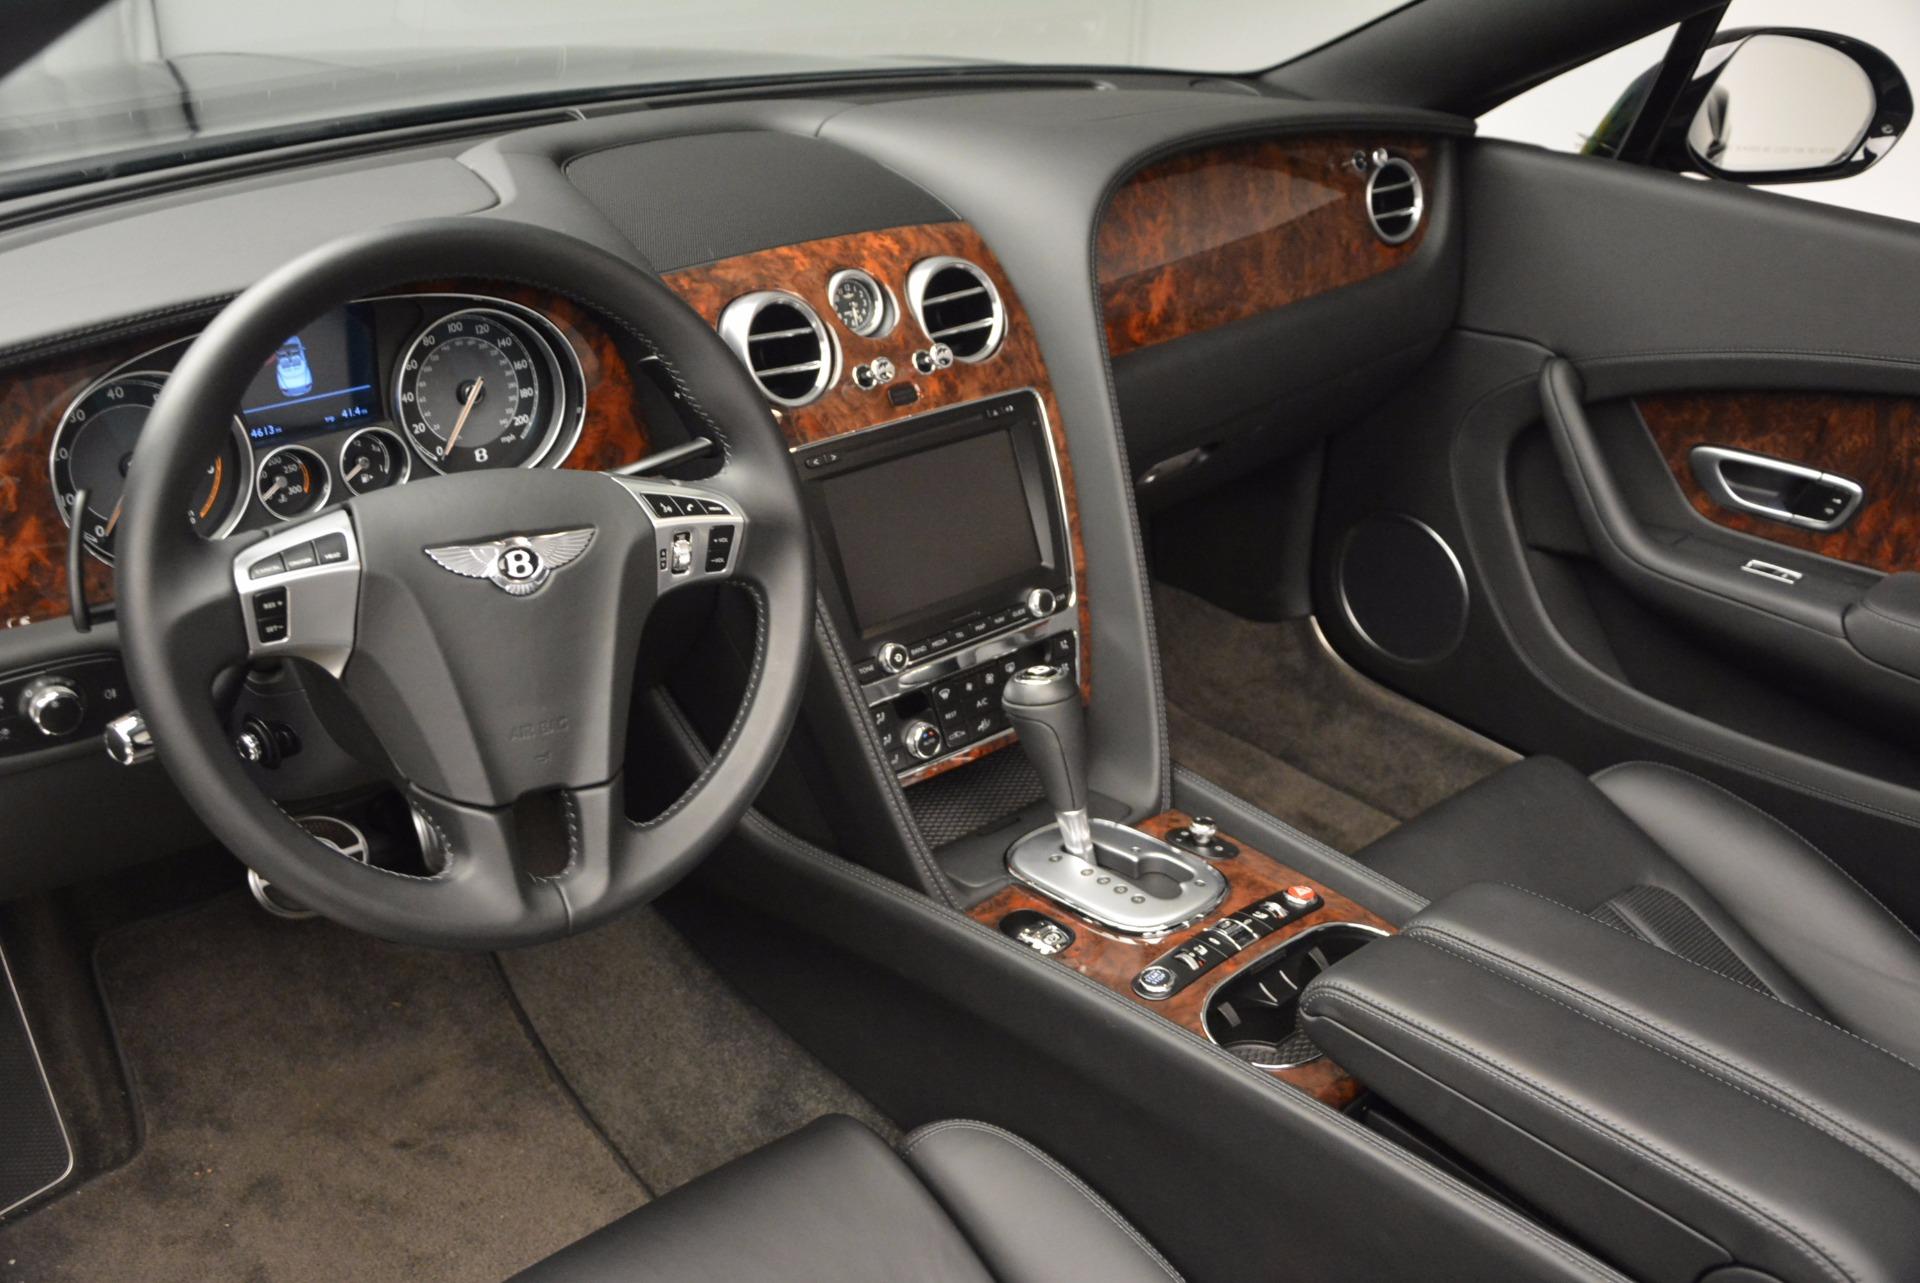 Used 2013 Bentley Continental GTC  For Sale In Westport, CT 646_p18